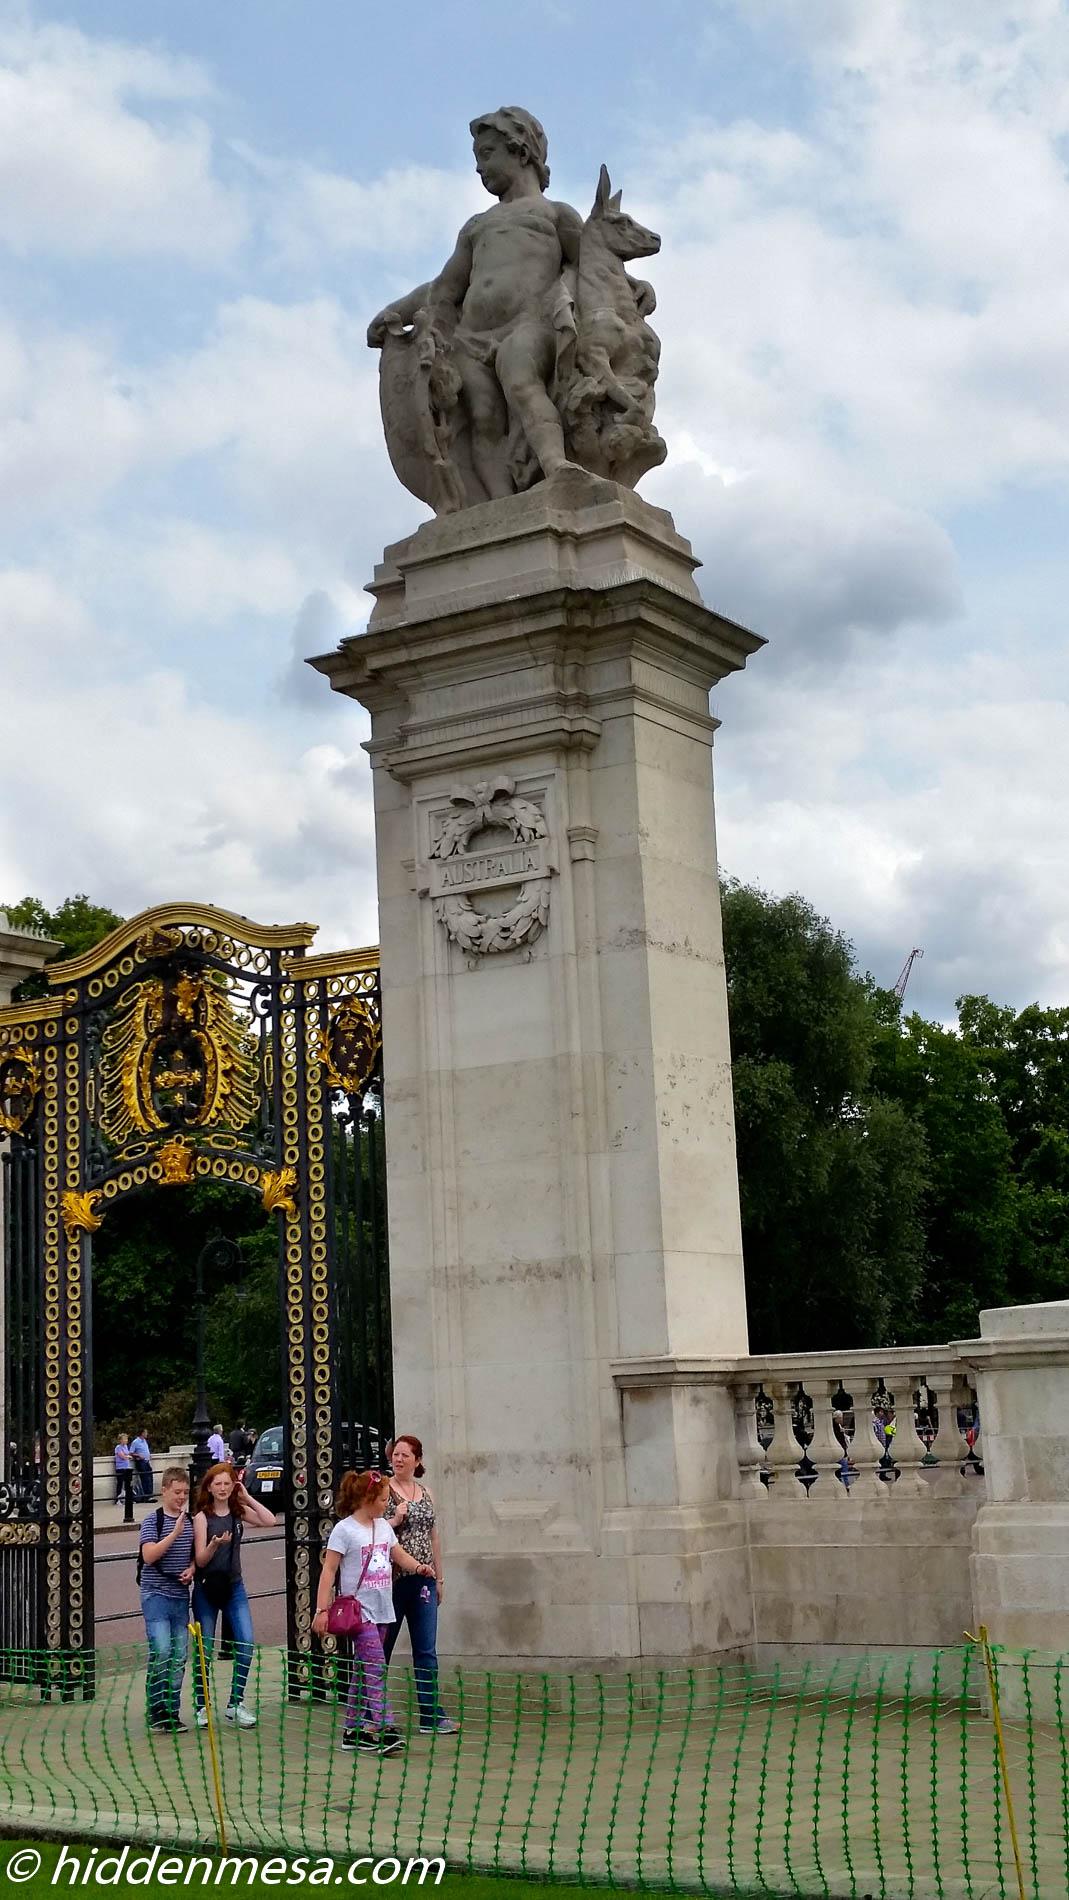 Australia Gate at Buckingham Palace